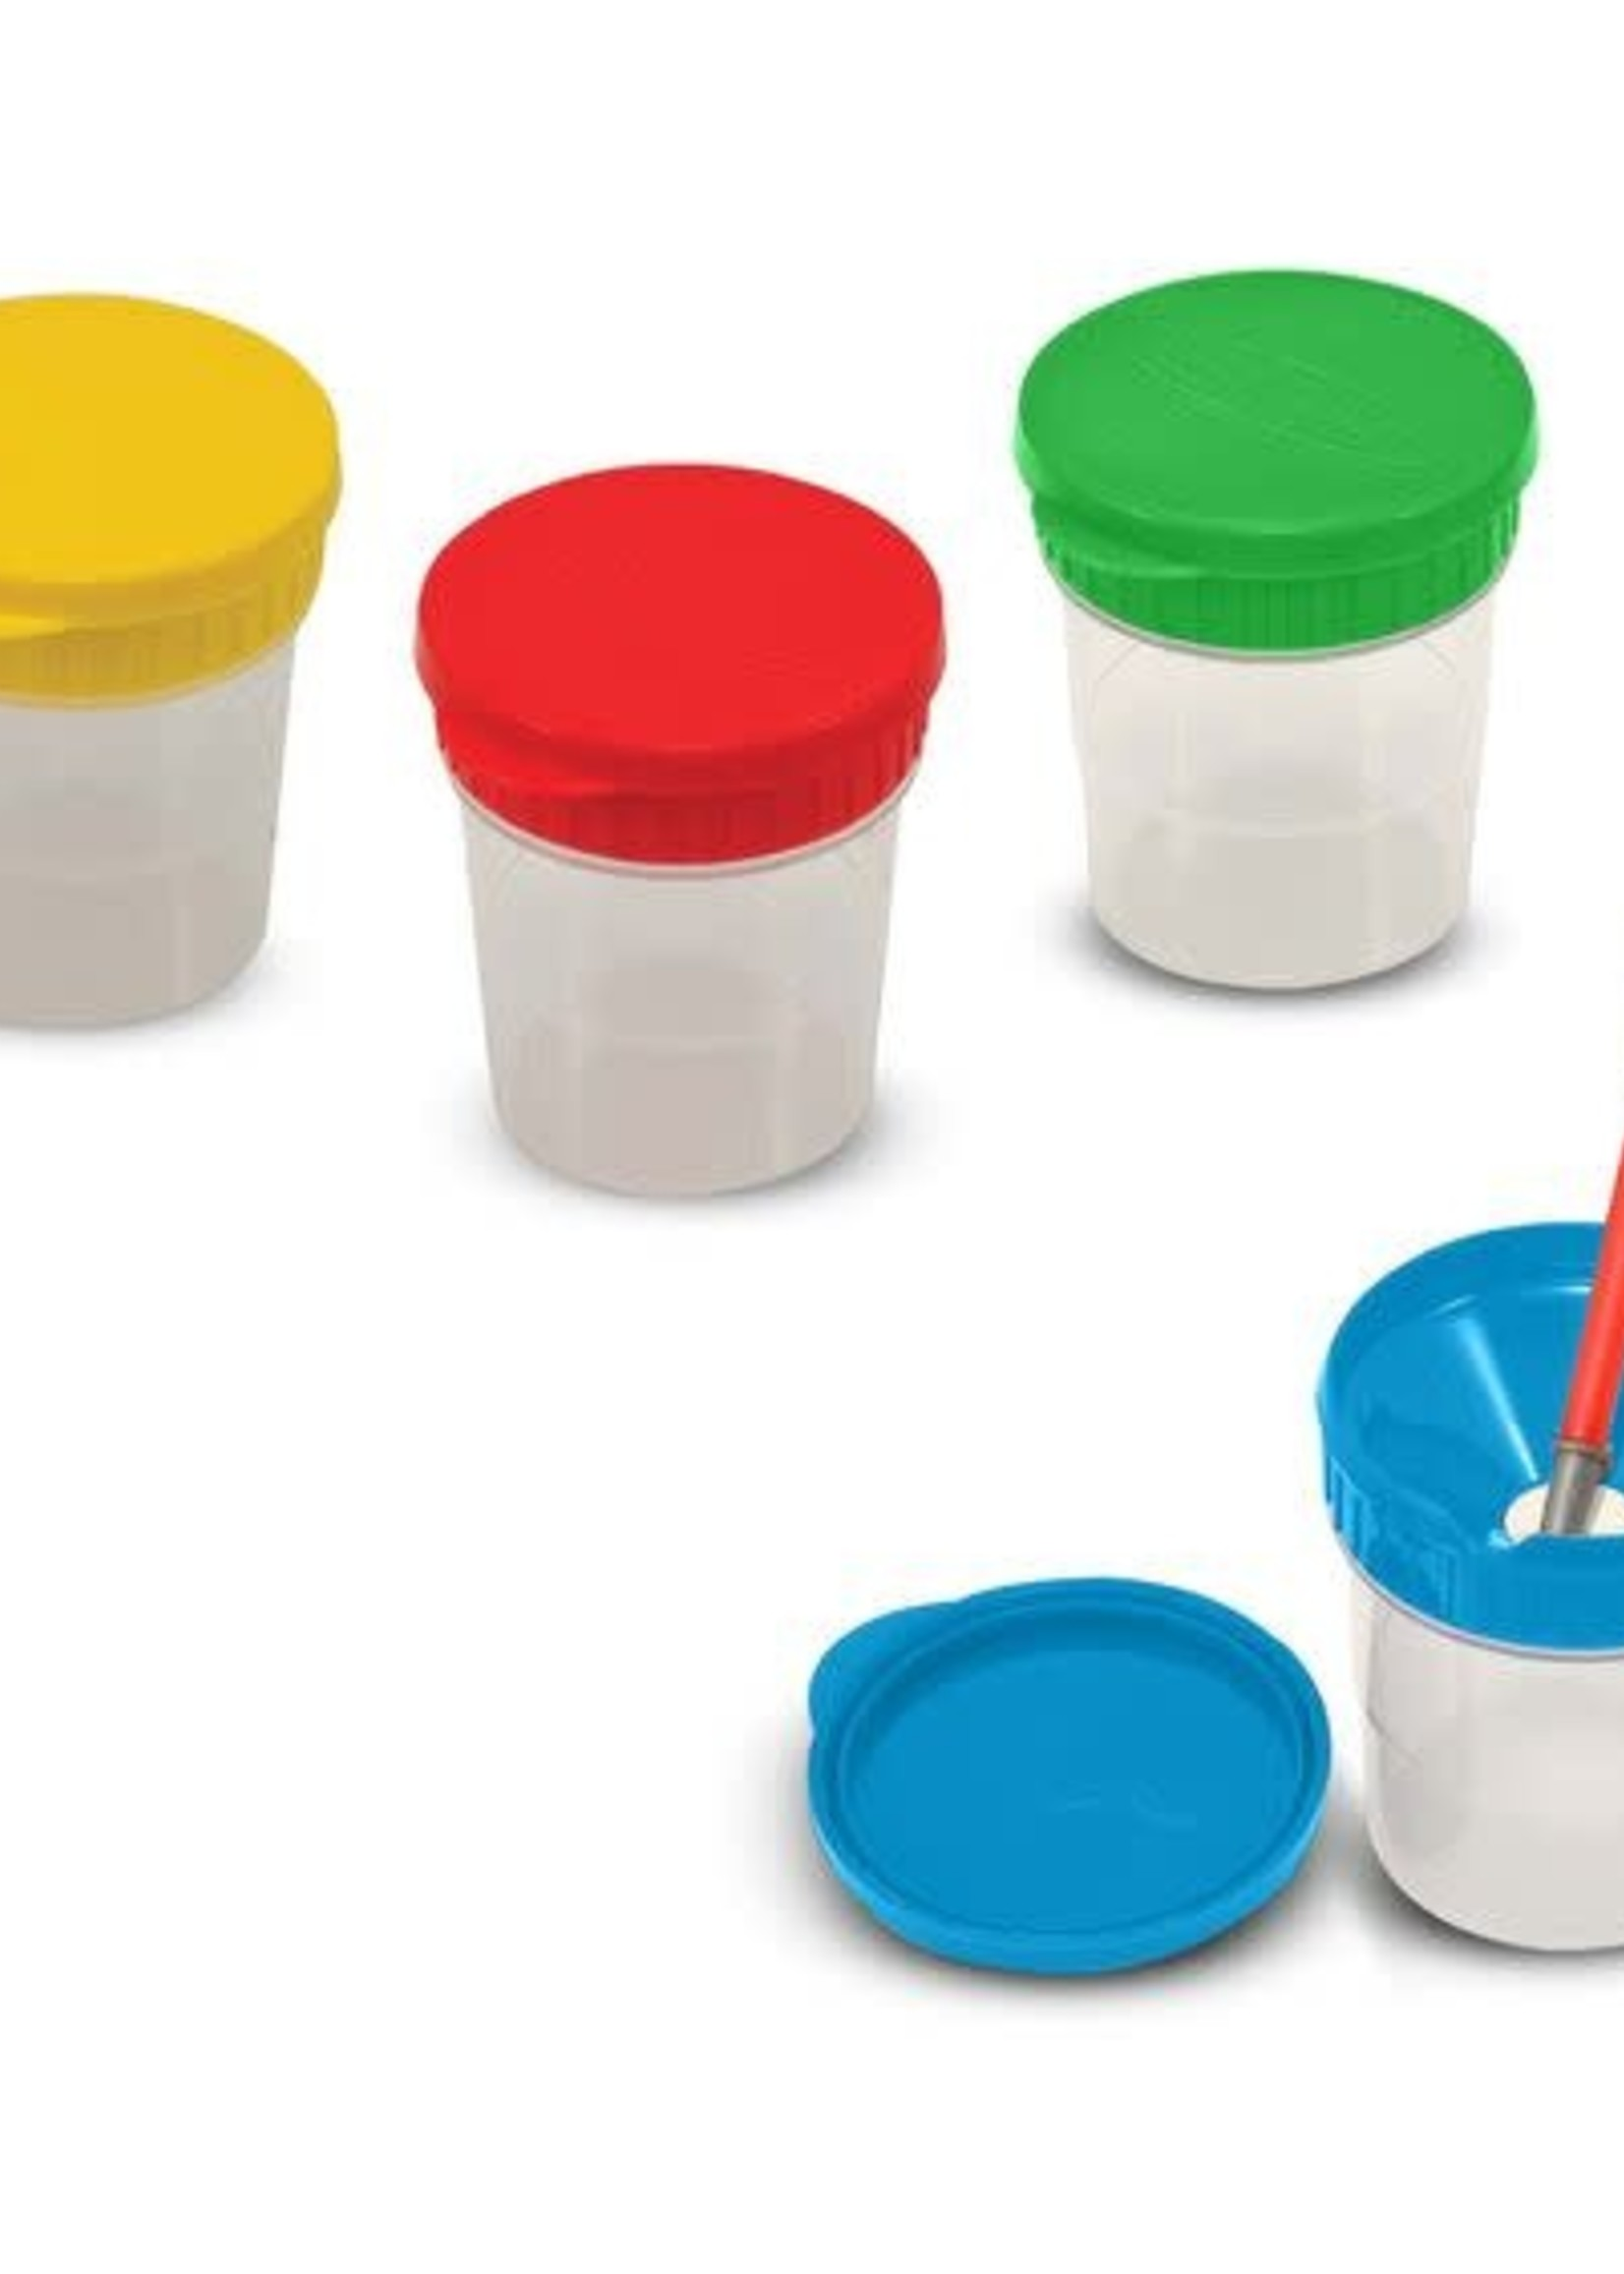 Melissa & Doug Spill-Proof Paint Cups